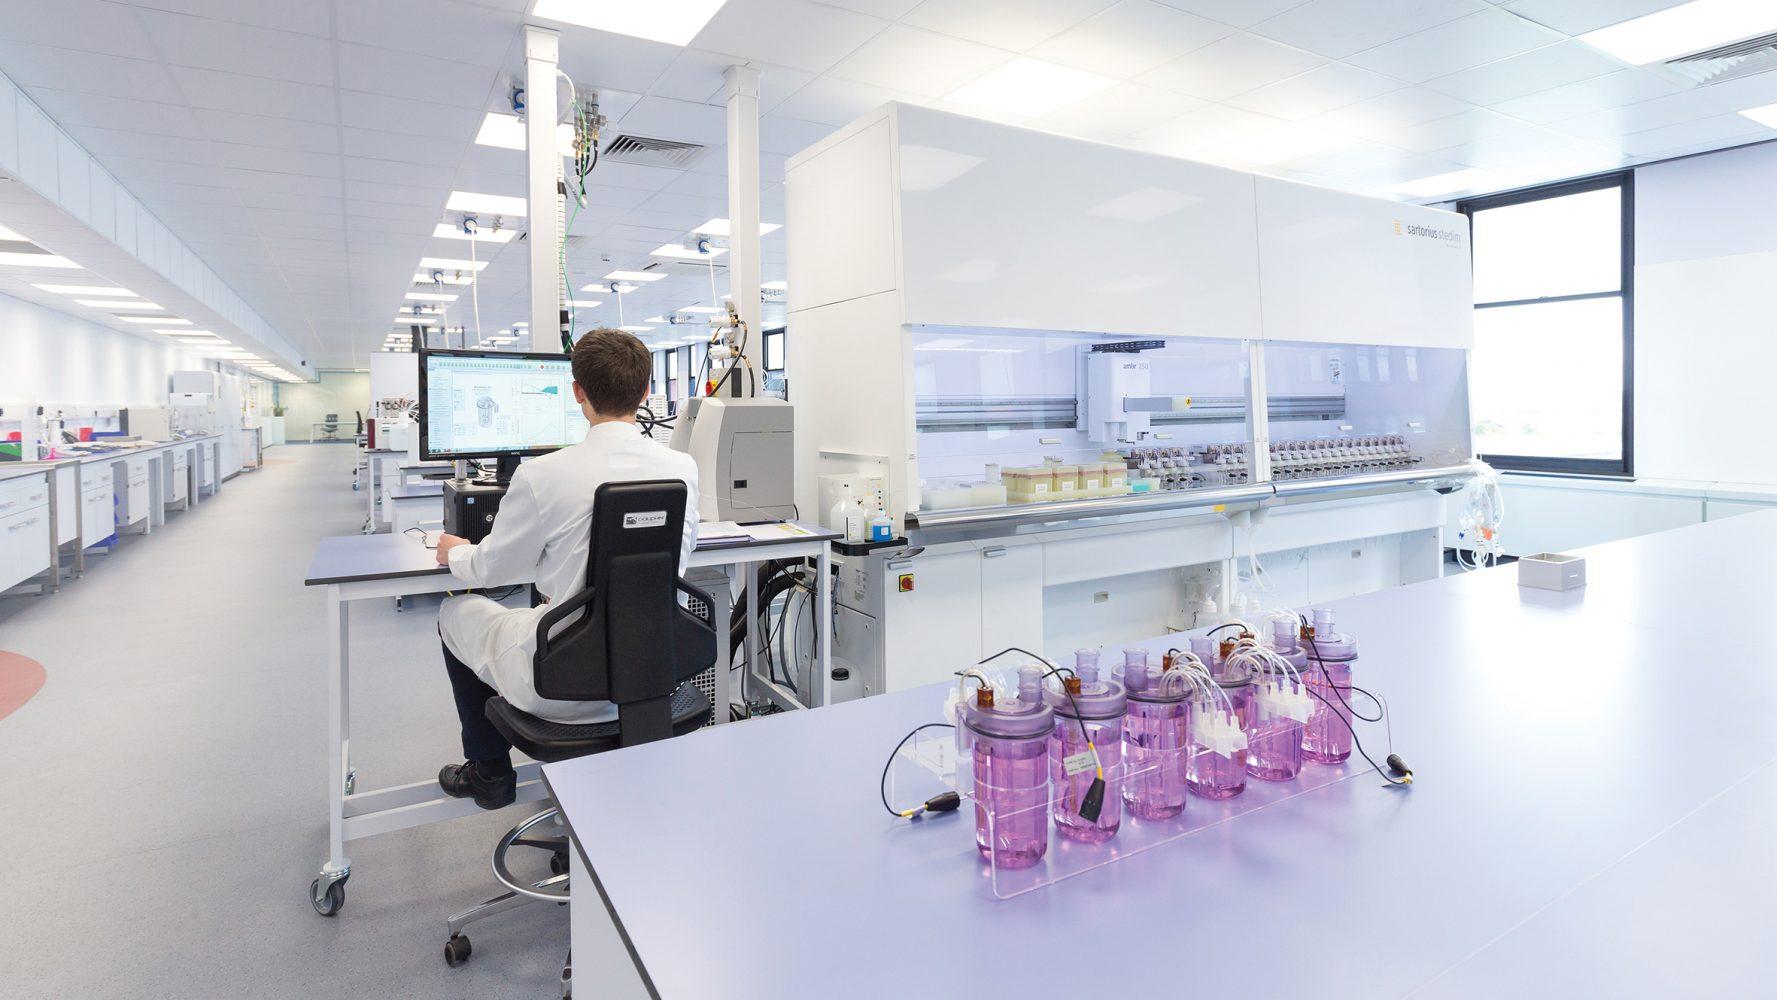 FUJIFILM Diosynth Biotechnologies Case Study - Trinity IM